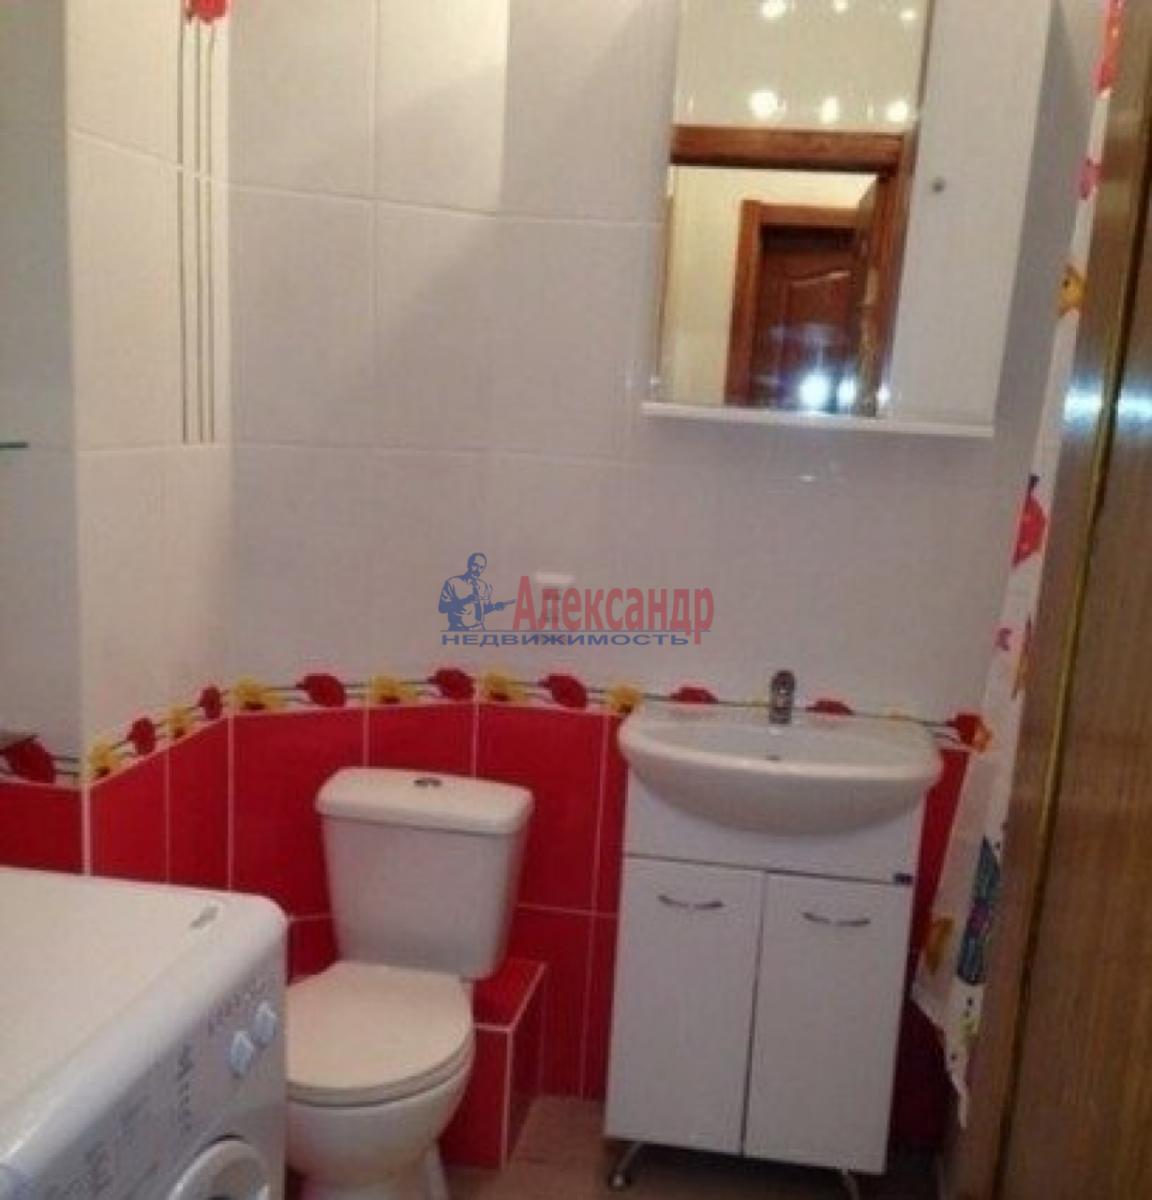 1-комнатная квартира (35м2) в аренду по адресу Старо-Петергофский пр., 28— фото 4 из 5